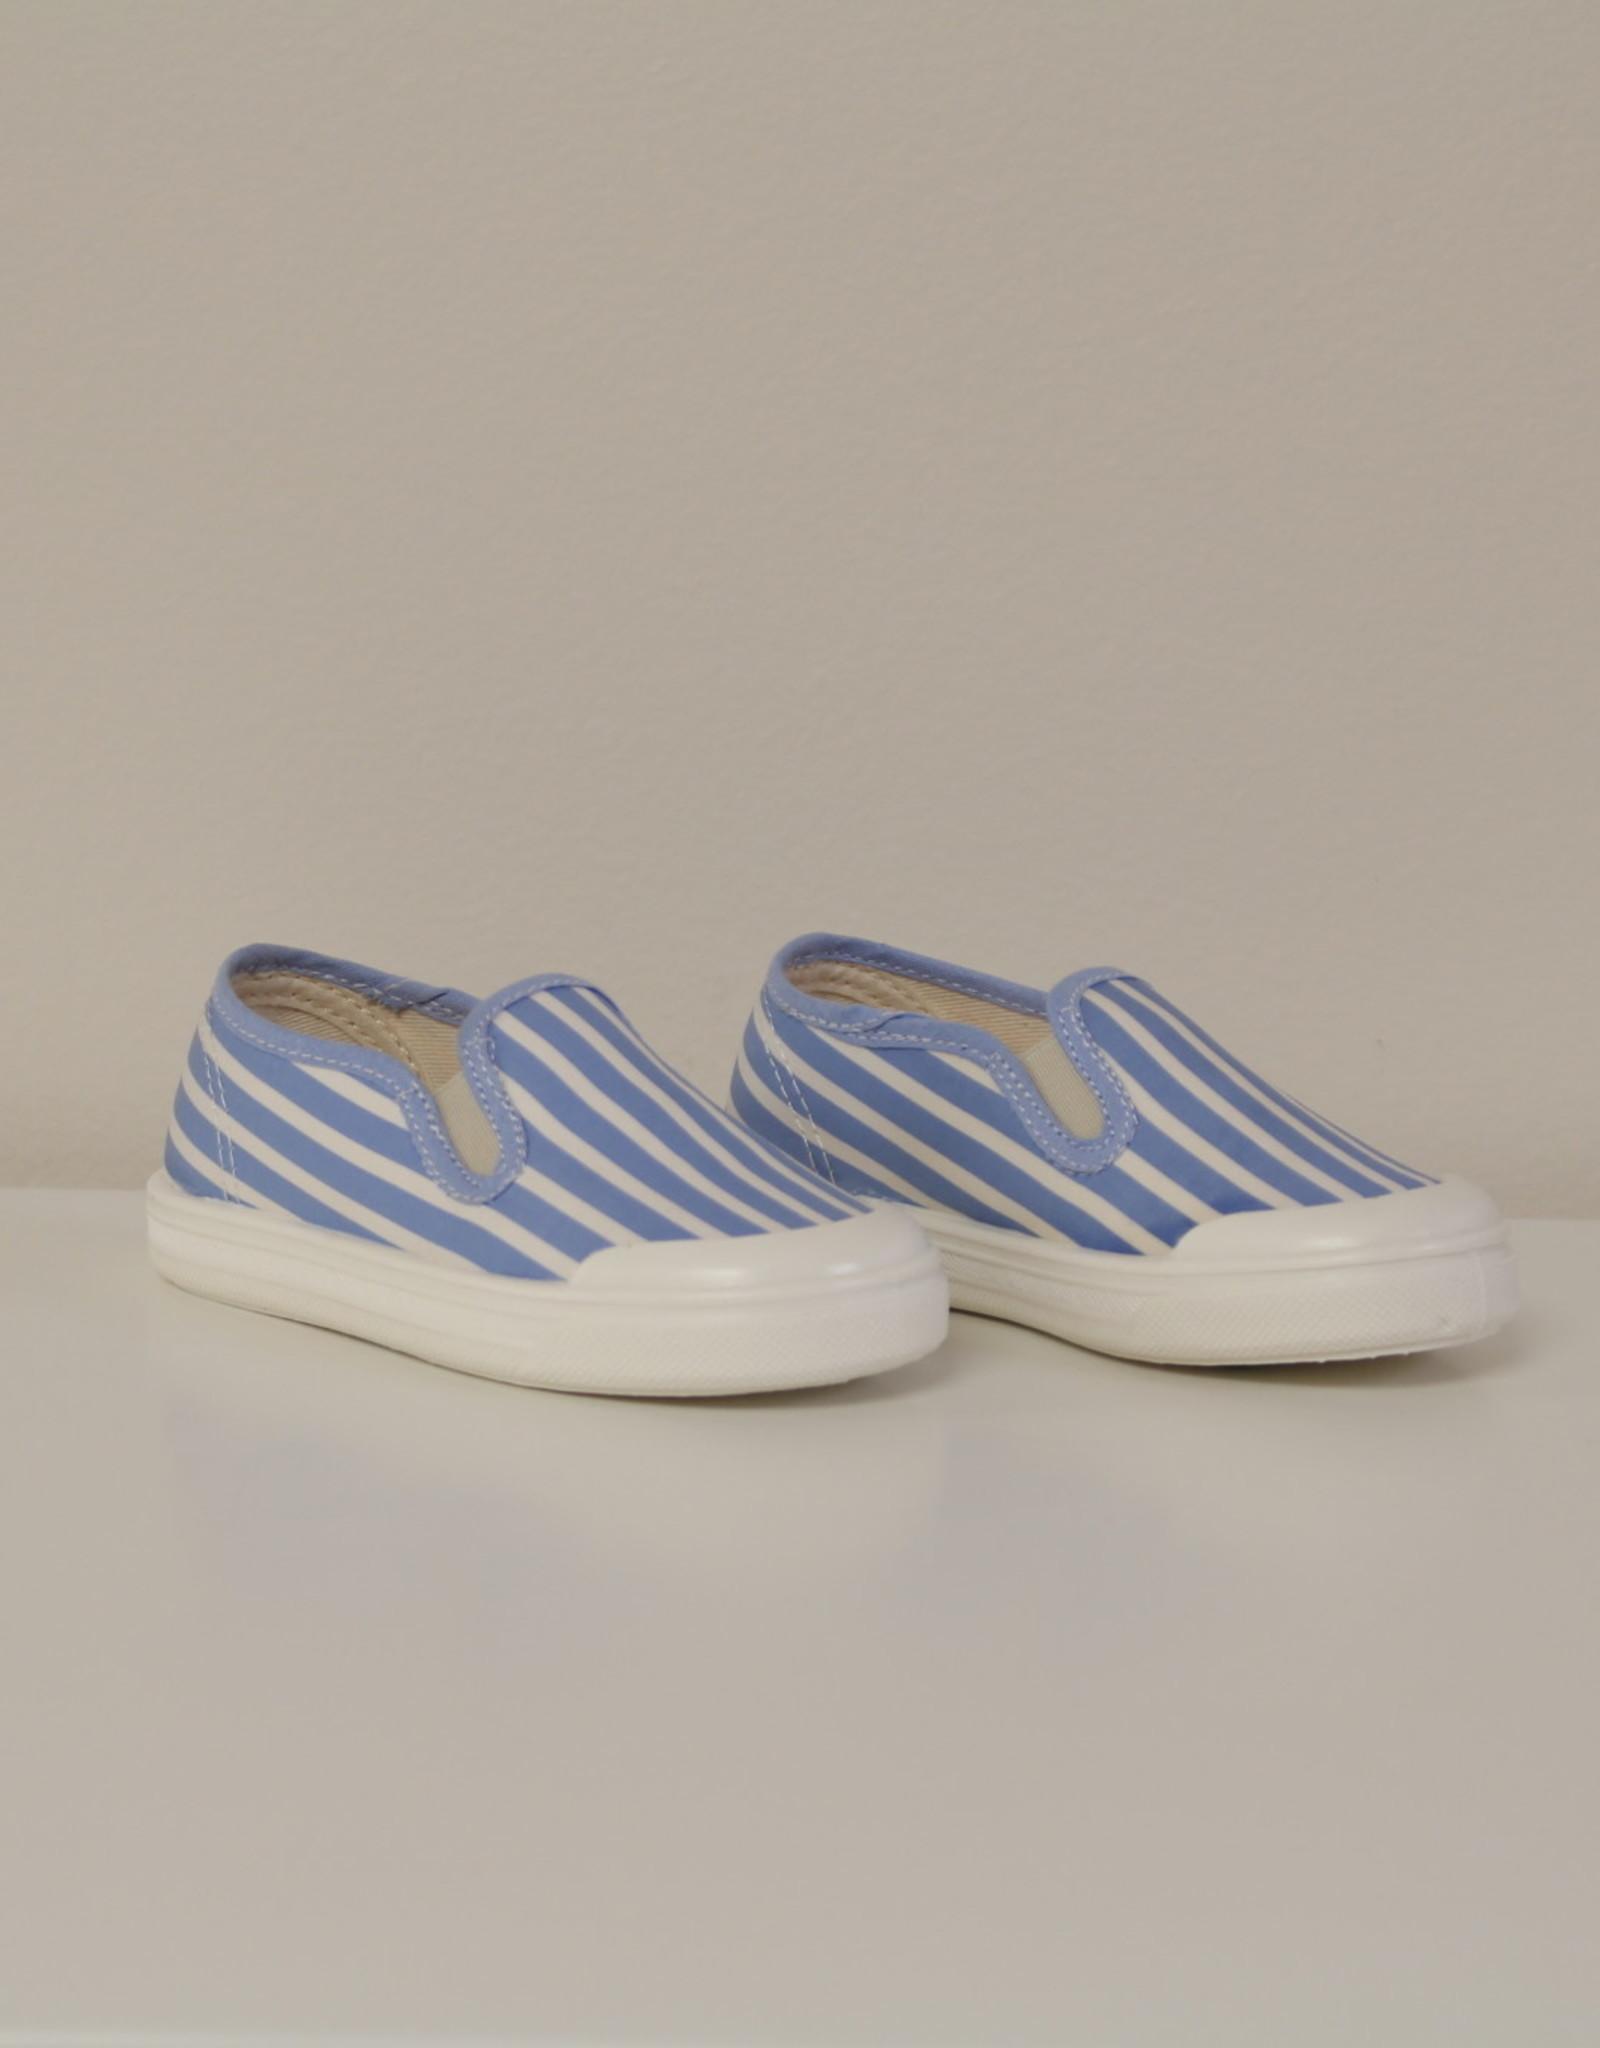 Pépé 00077 Tessuto shirt righe blauw/wit gestreept slip-on